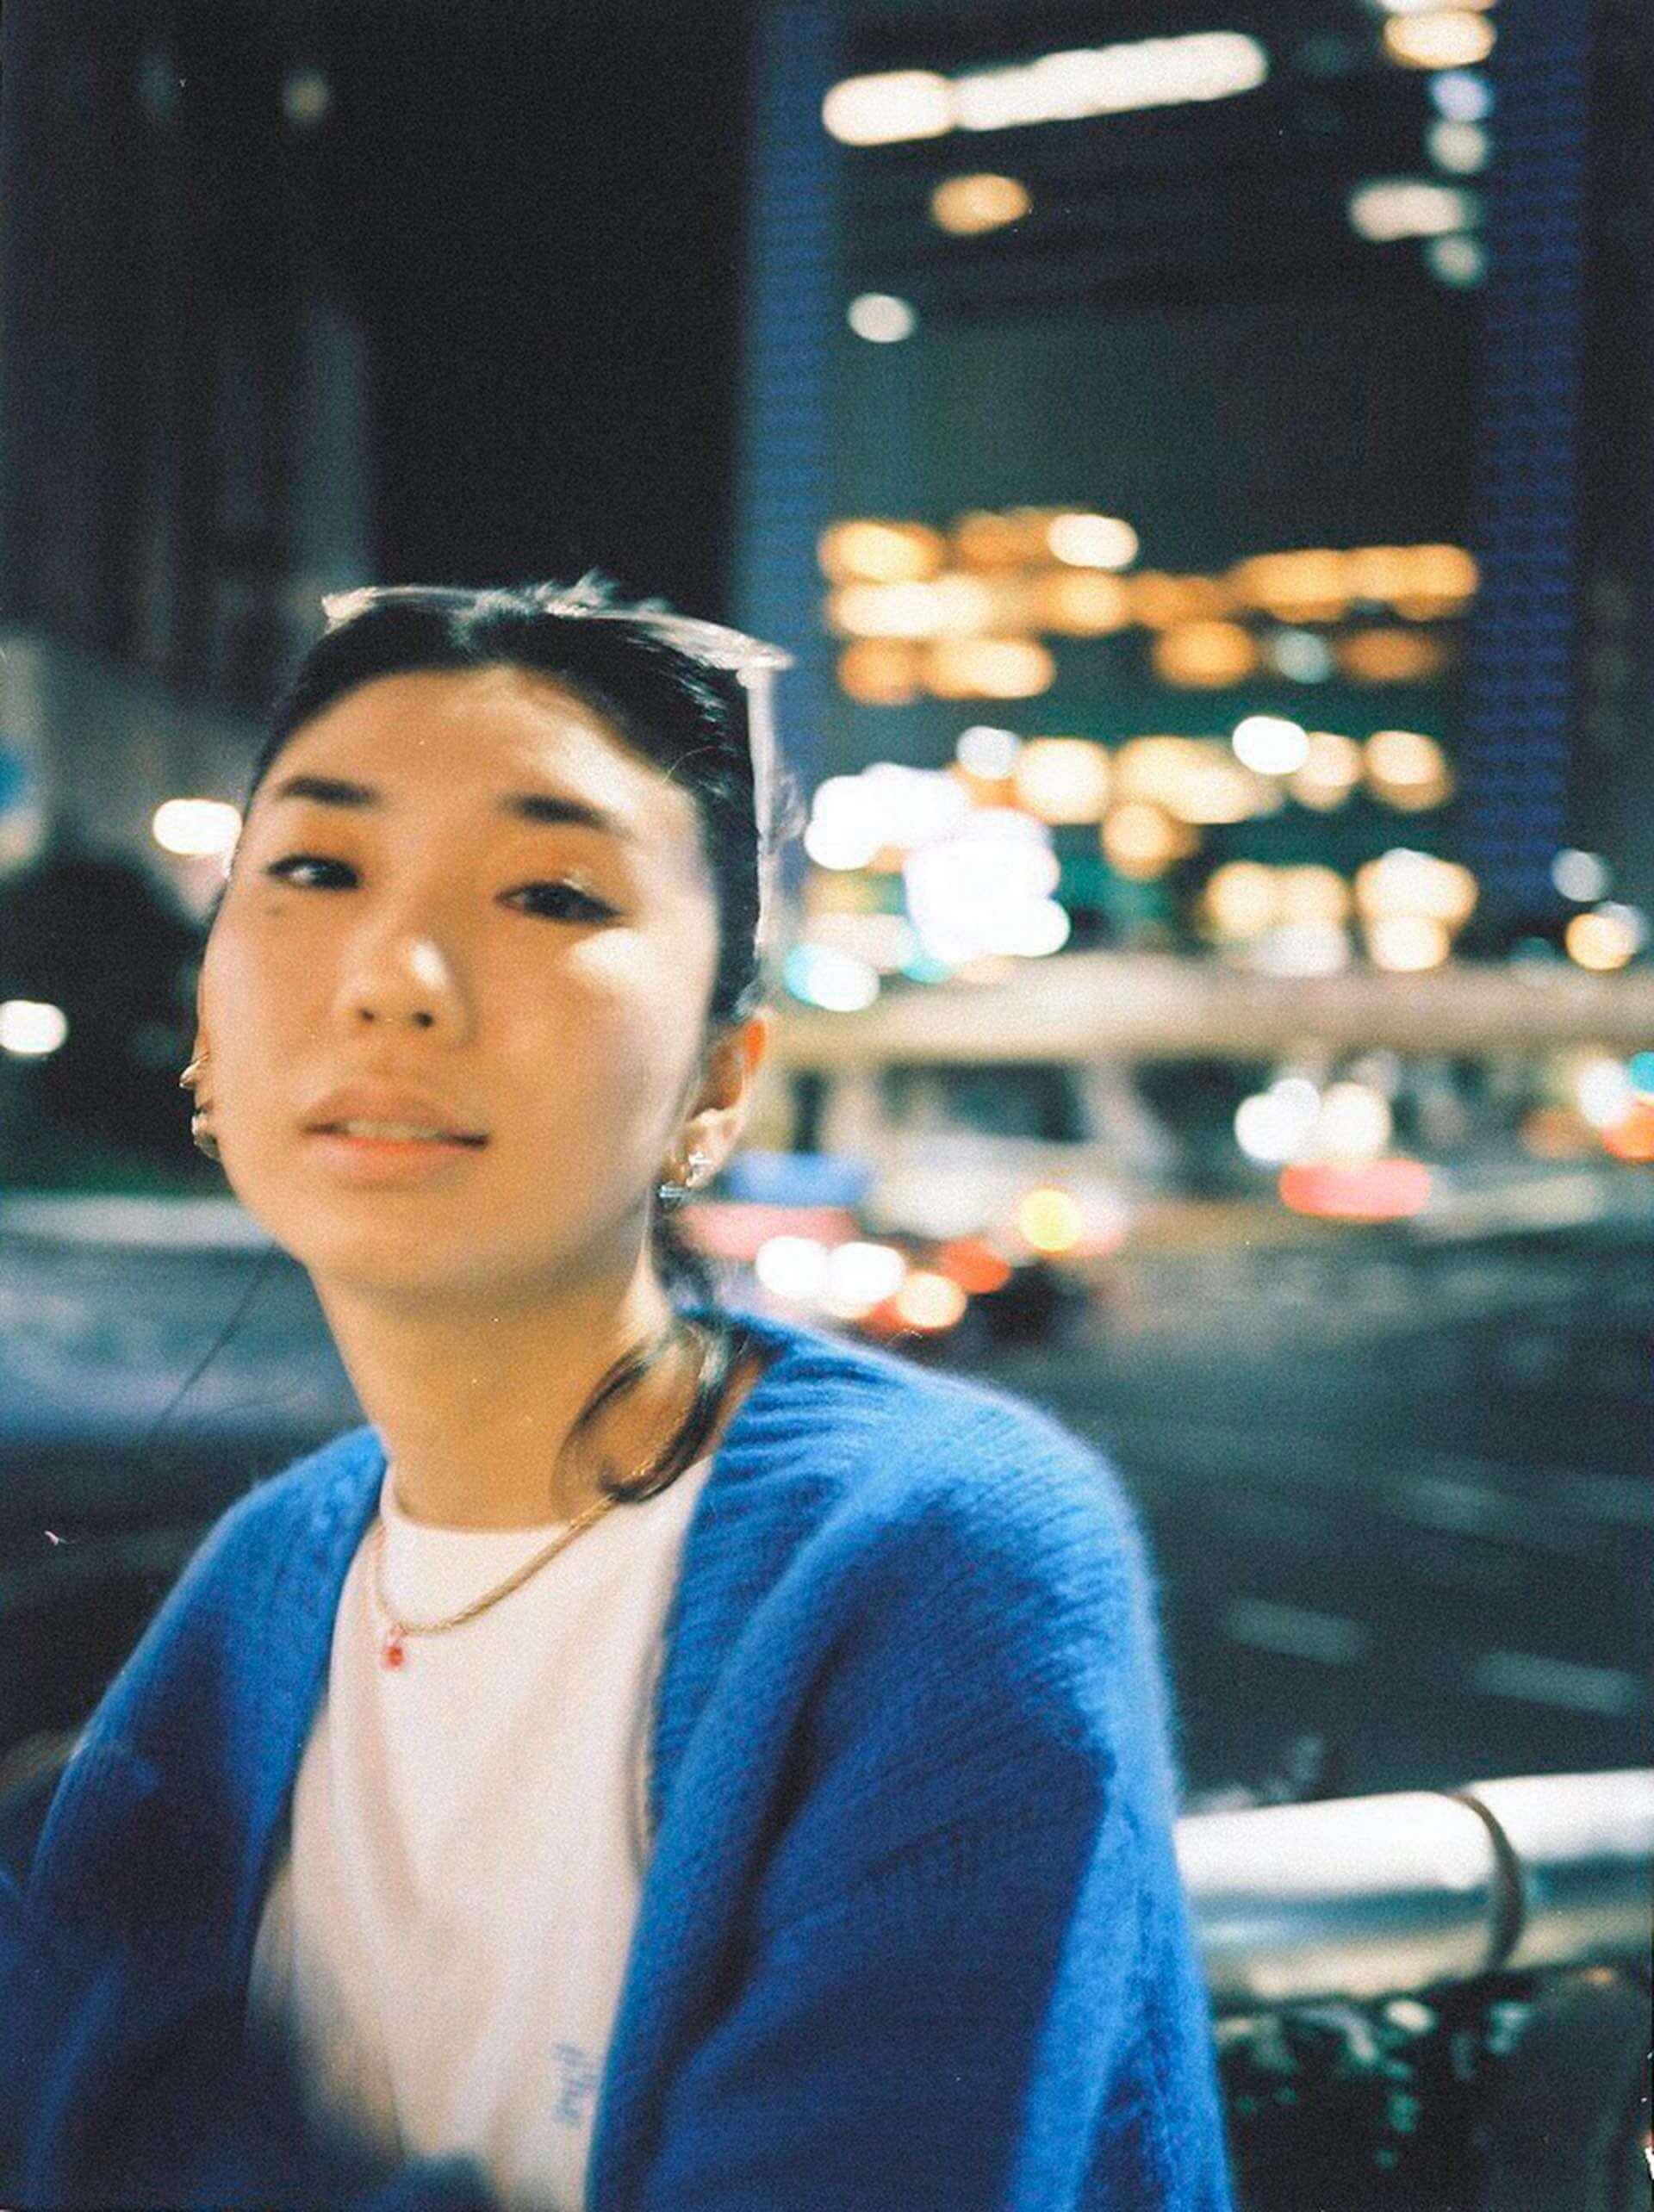 "erie&FKDの新曲""Intuition""がデジタルリリース!Shinji ItoUによるアートワークを施したTシャツも発売 music210225_erie_5-1920x2568"